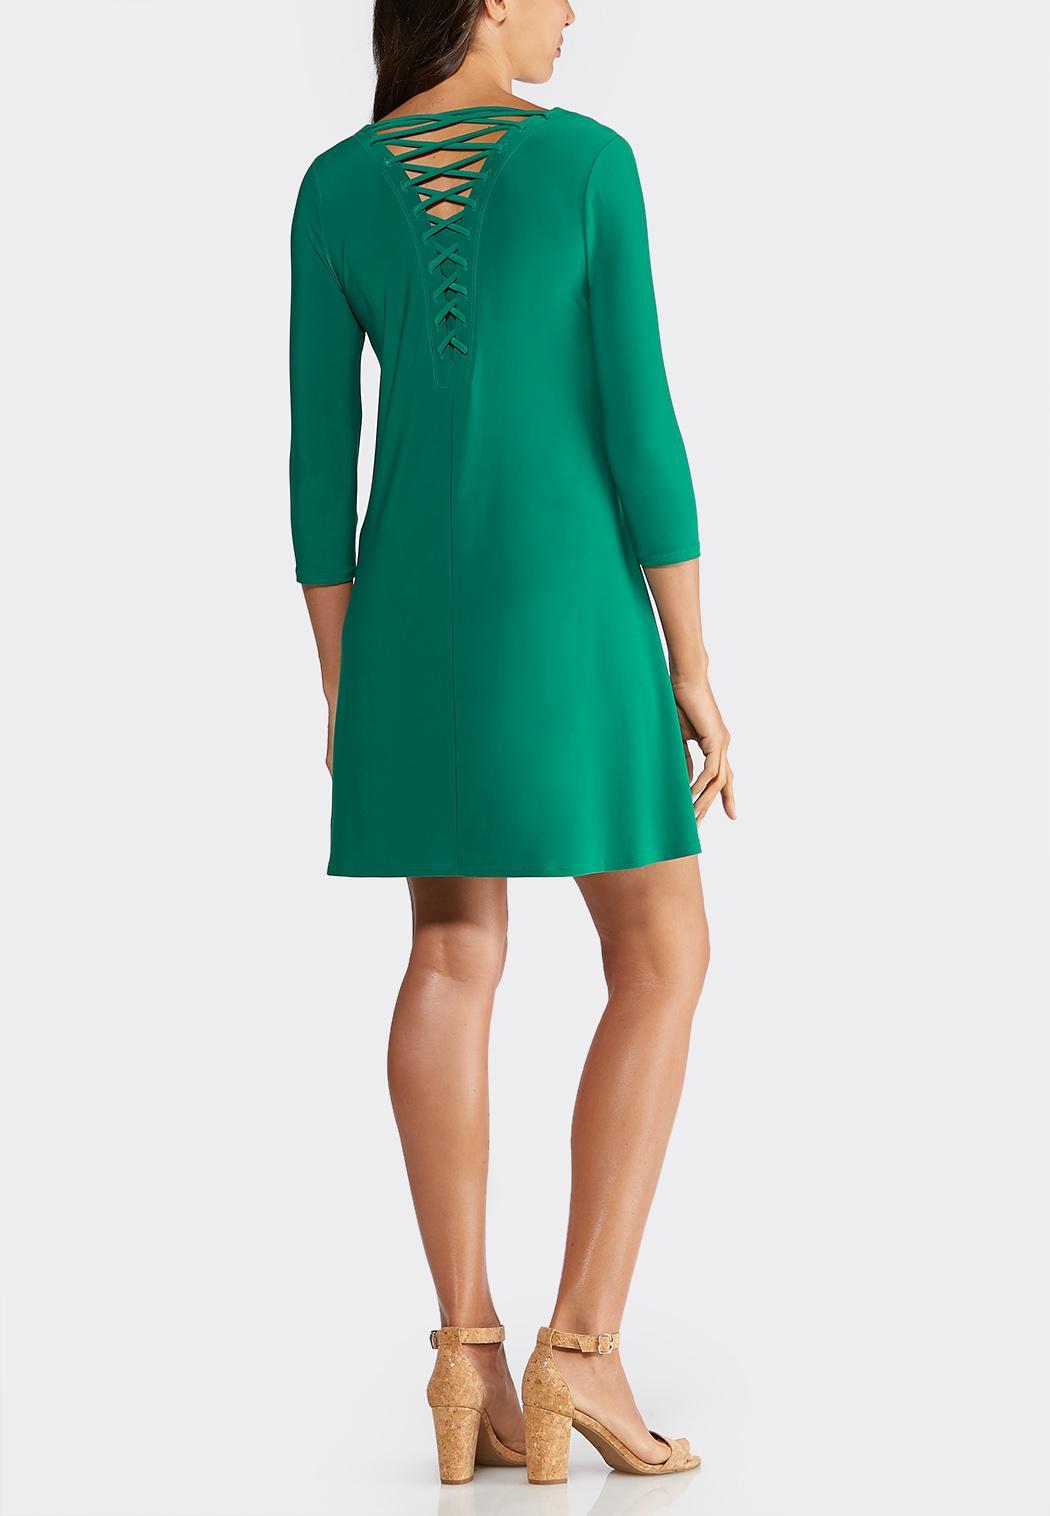 Strappy Back Swing Dress (Item #43933126)